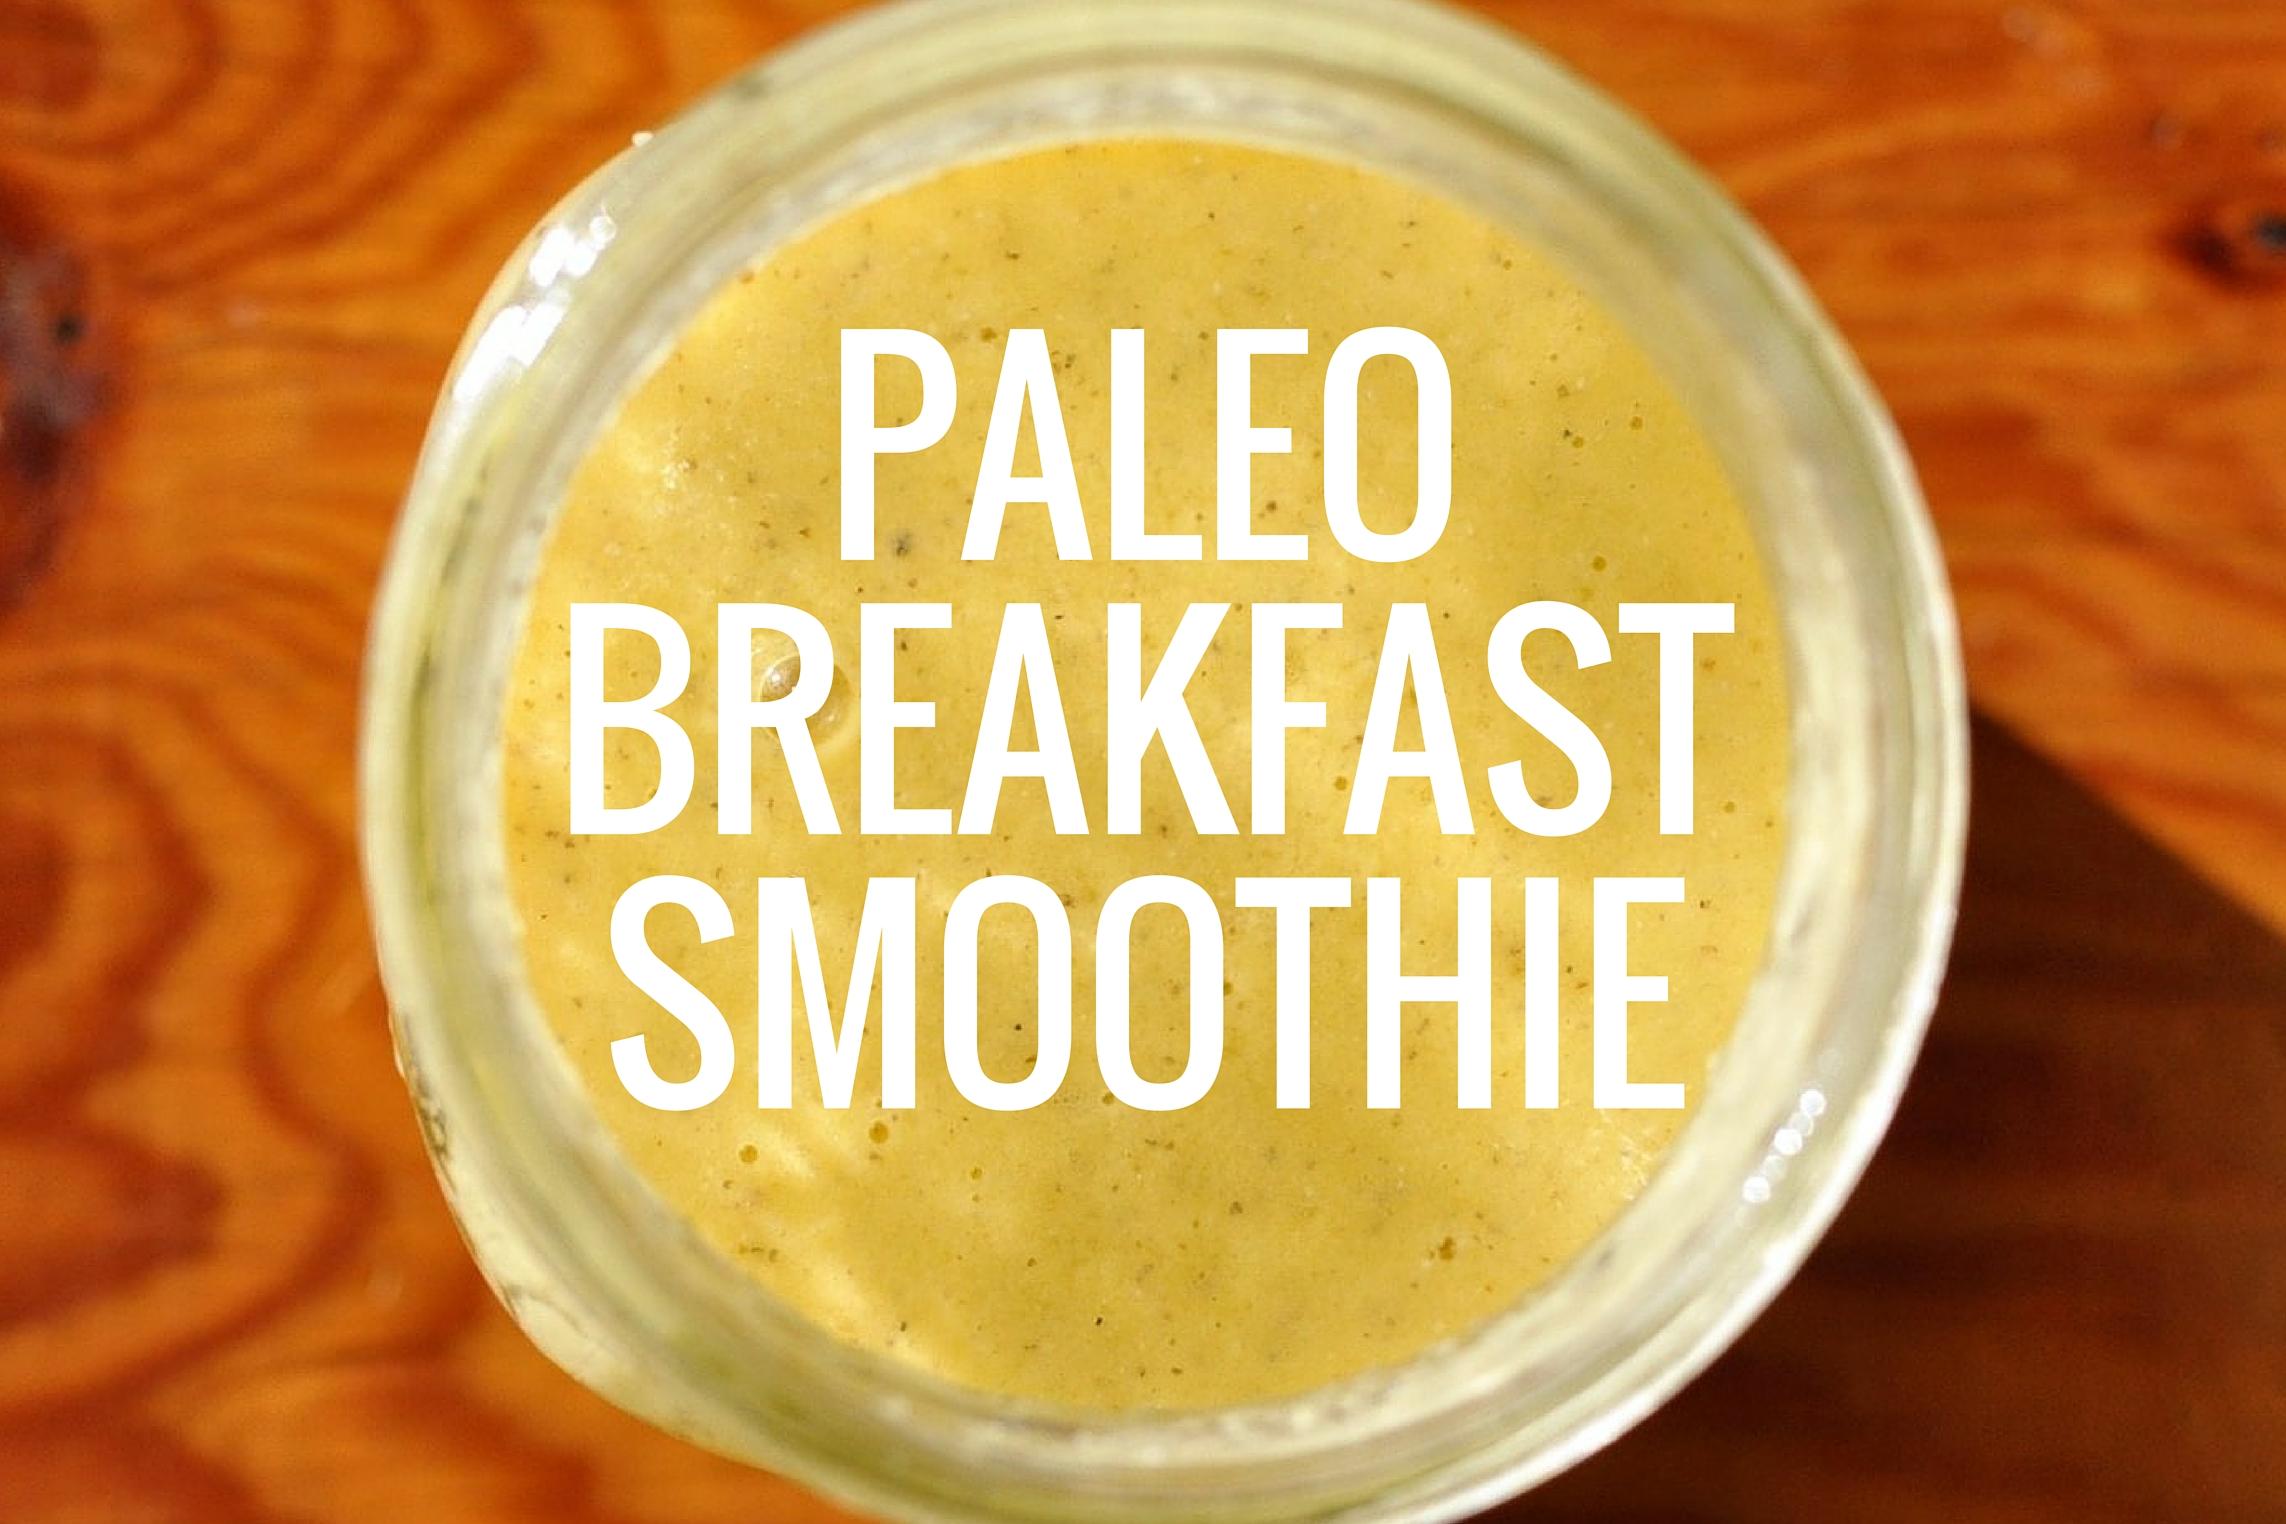 Paleo Breakfast Smoothie Recipe